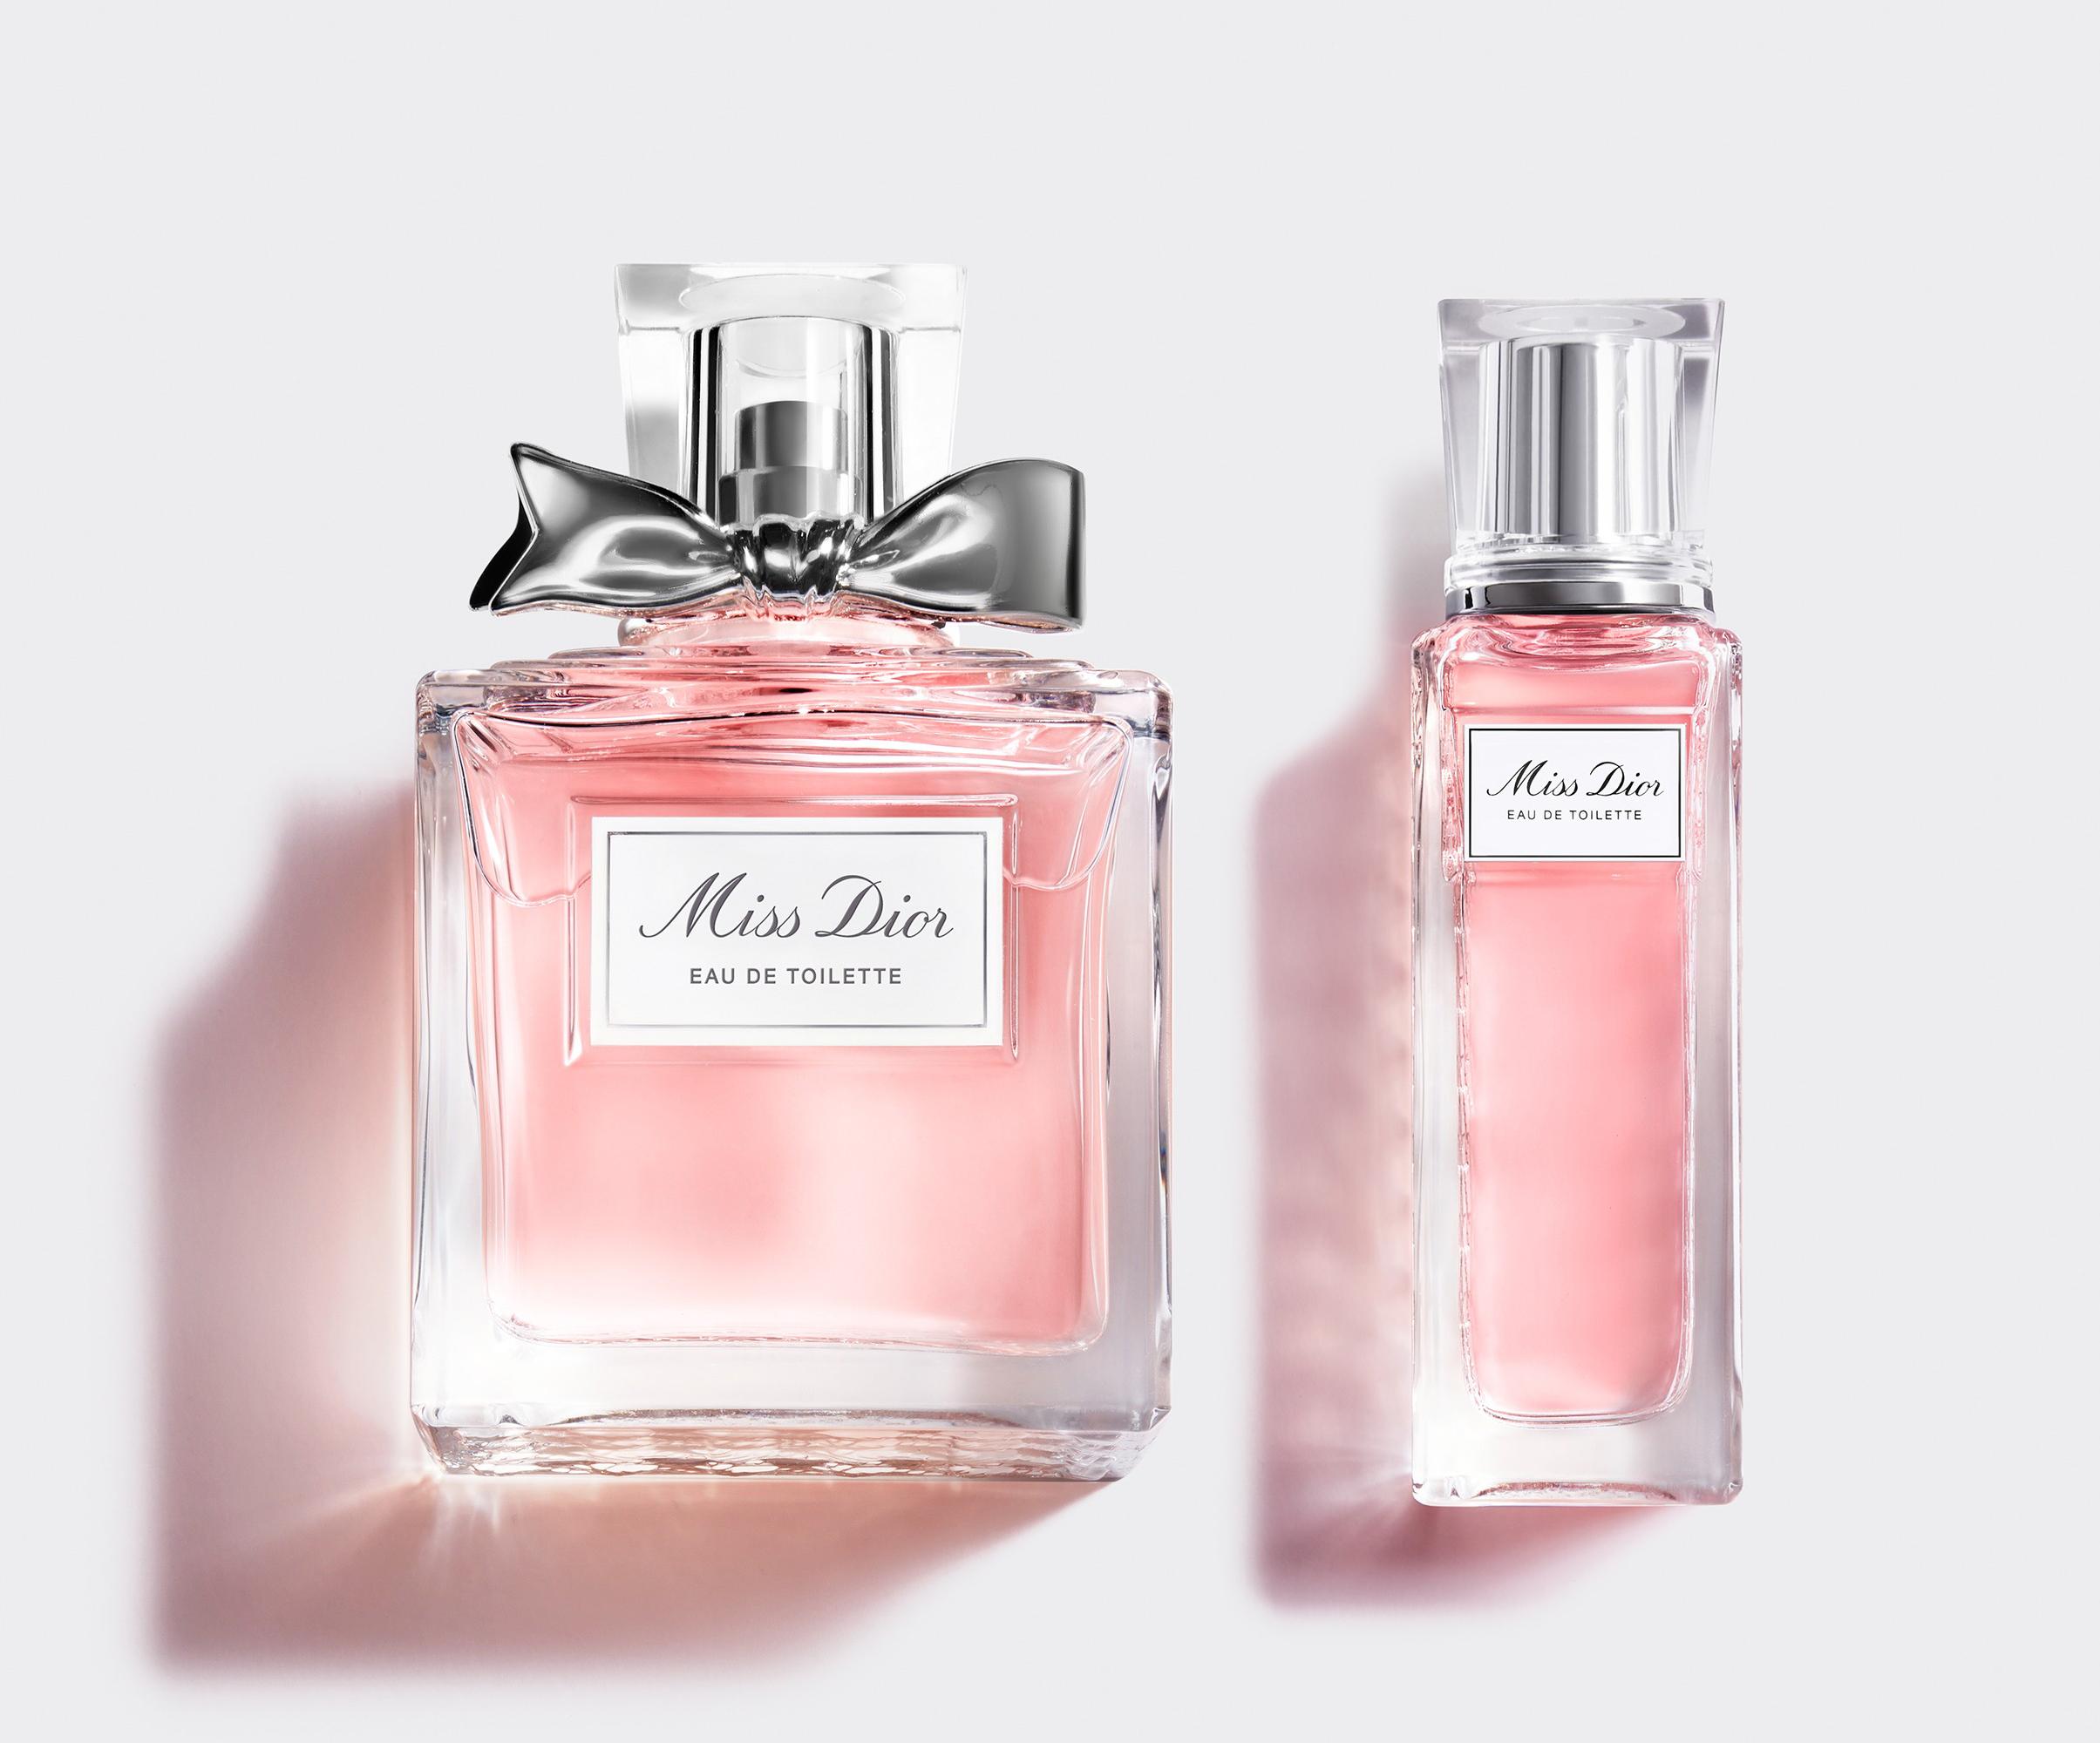 Christian-Dior-Miss-Dior-Eau-de-Toilette-2019-Edition2